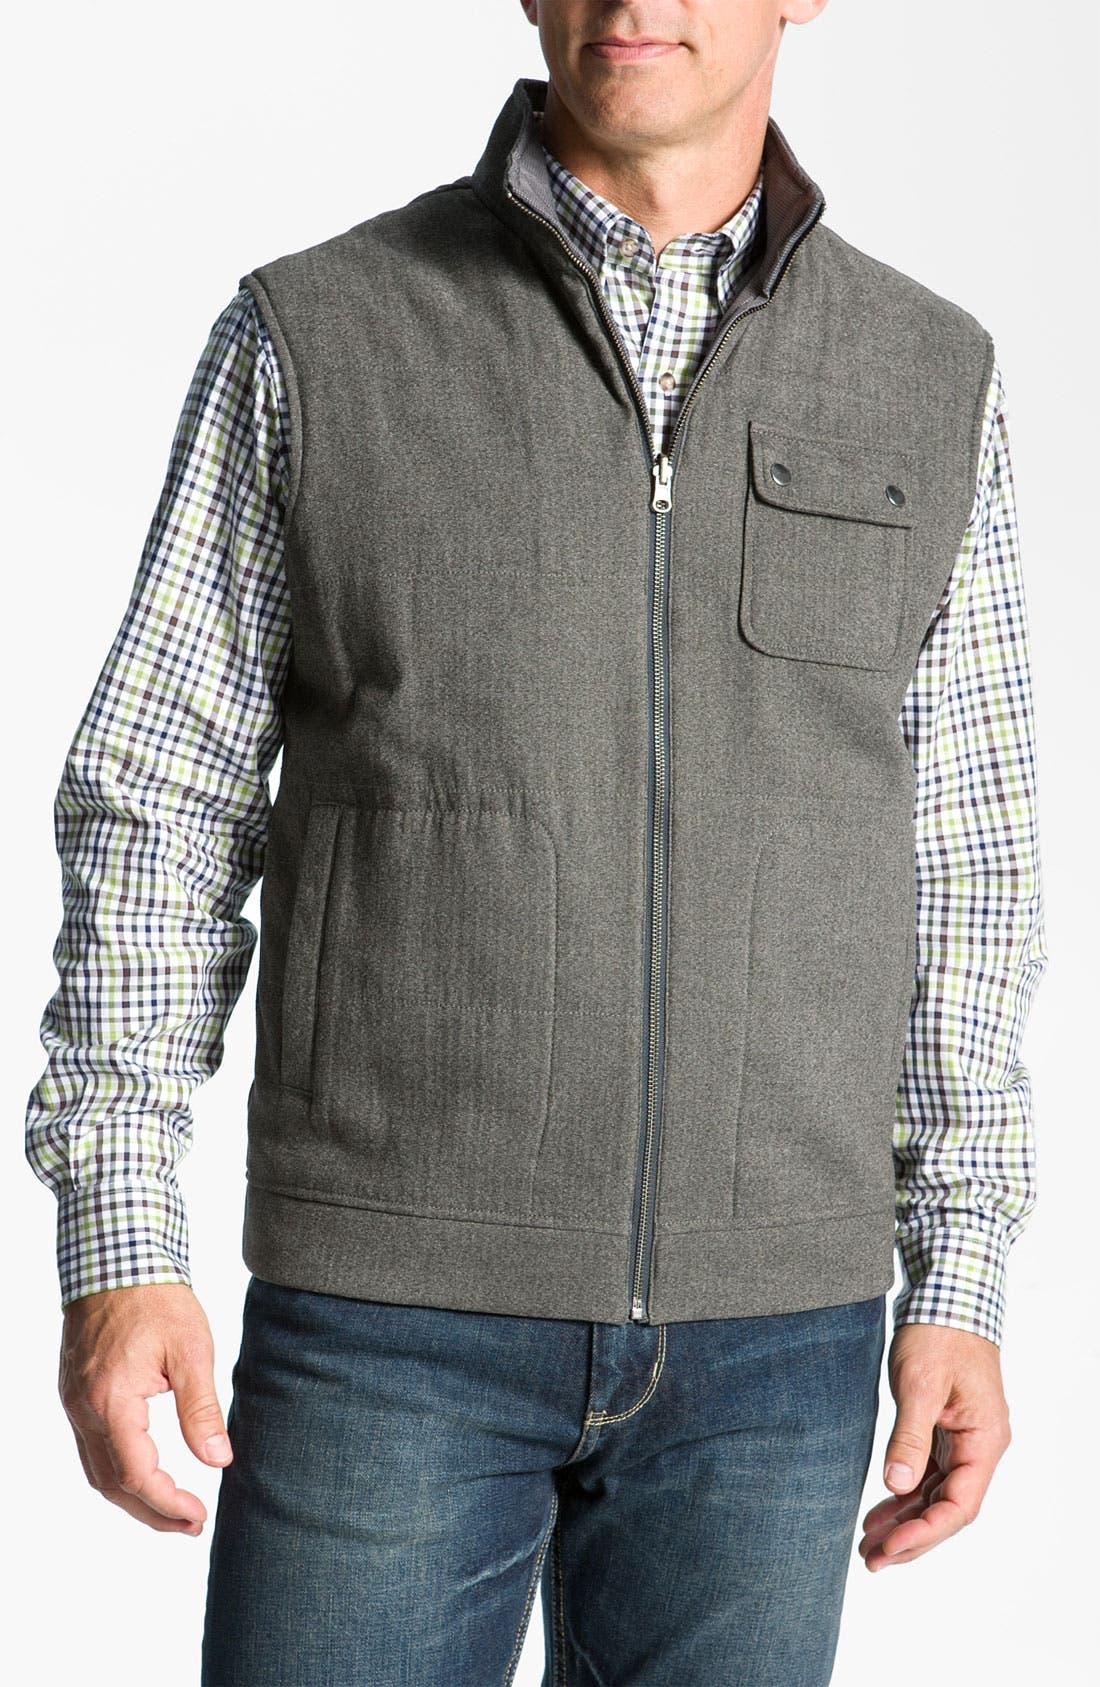 Alternate Image 1 Selected - Cutter & Buck 'Mount Baker' Reversible Vest (Big & Tall) (Online Only)